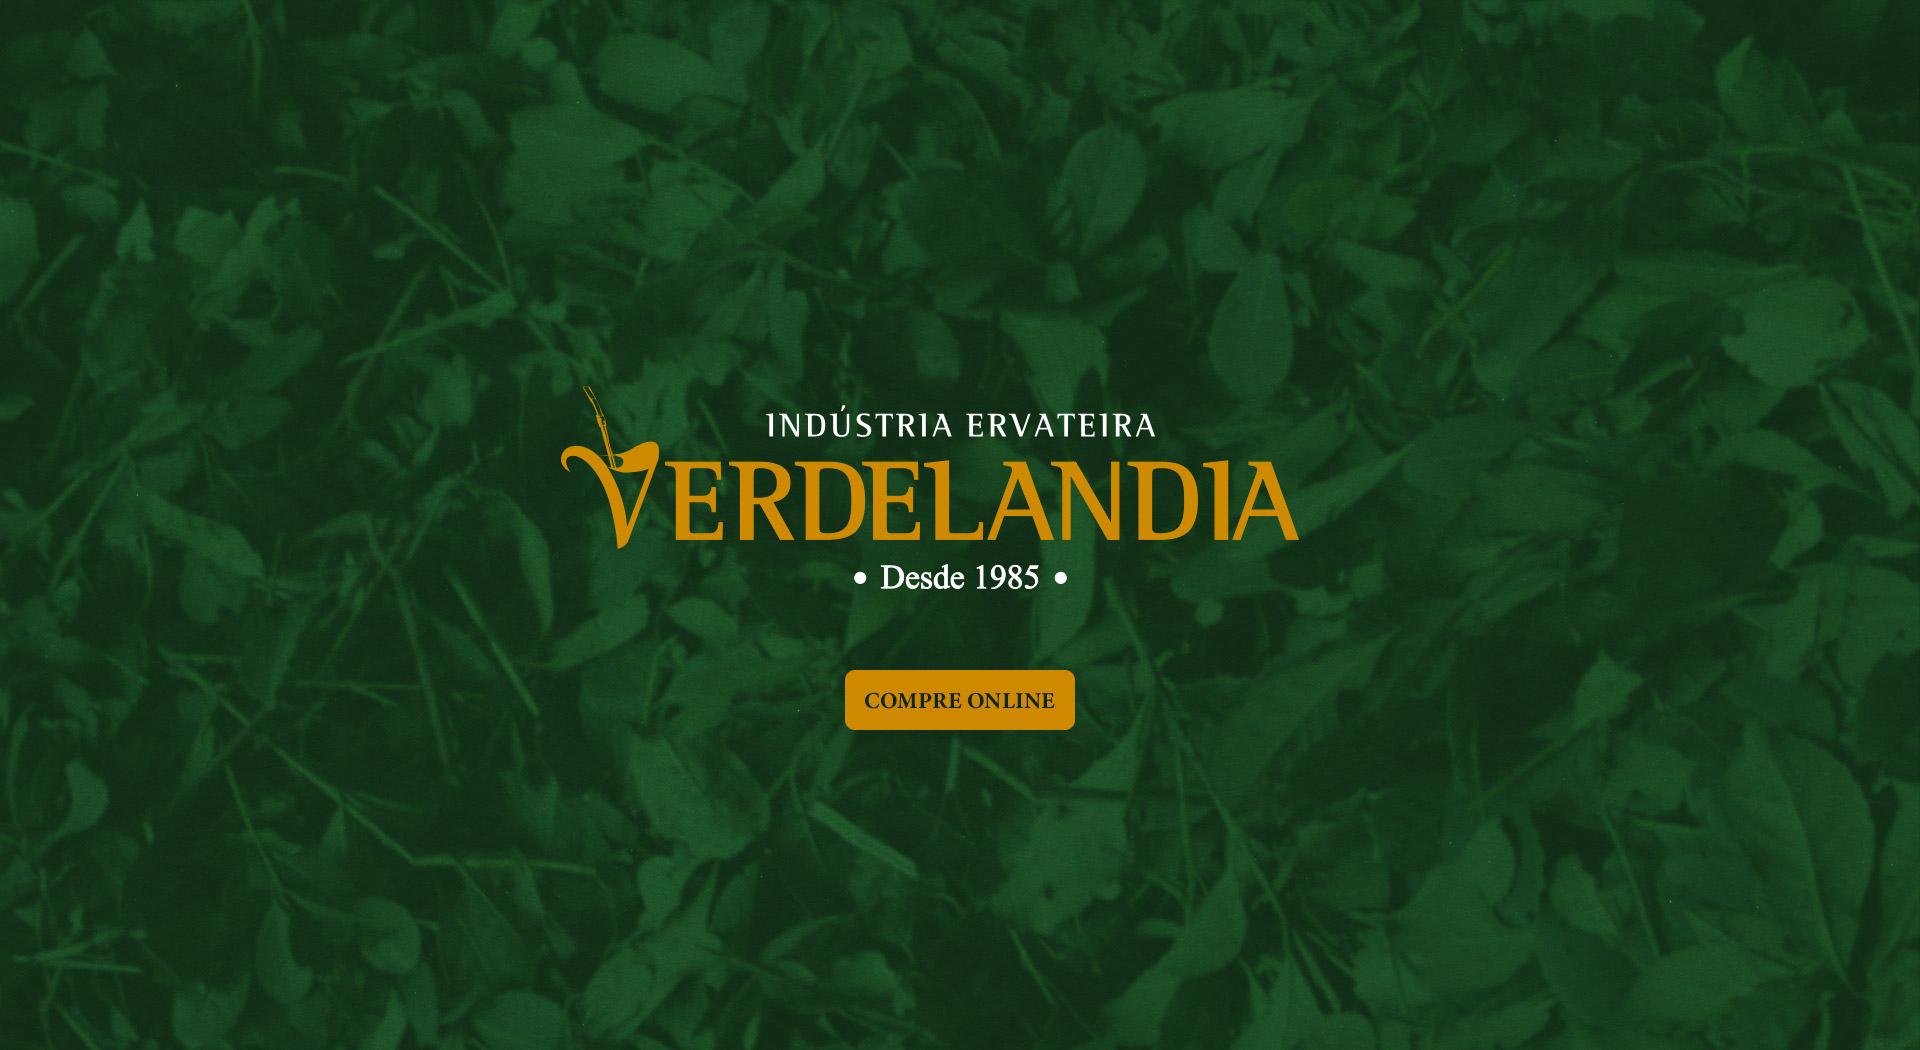 Indústria Ervateira Verdelândia – Compre Online